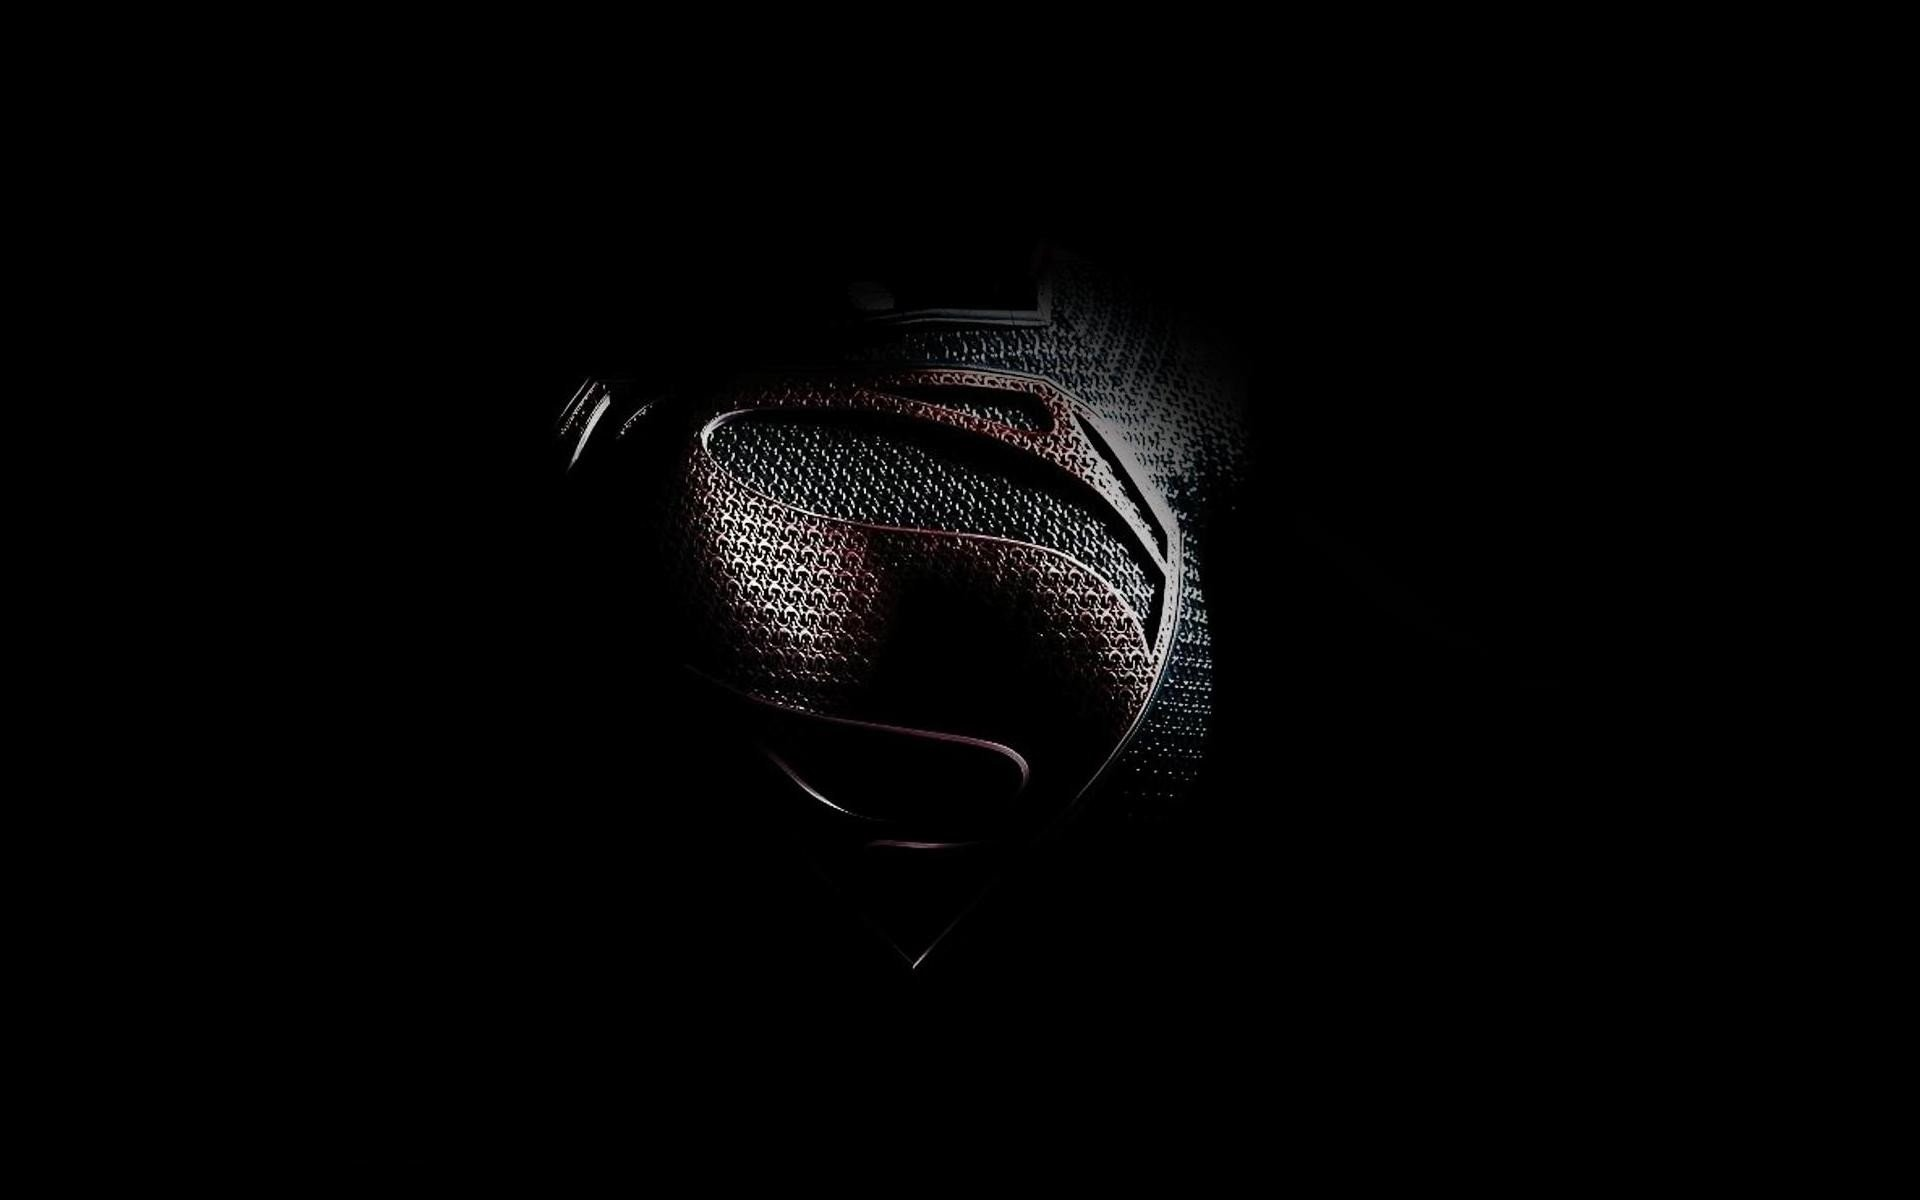 Black minimalistic movies Superman Man of Steel (movie) wallpaper      301966   WallpaperUP